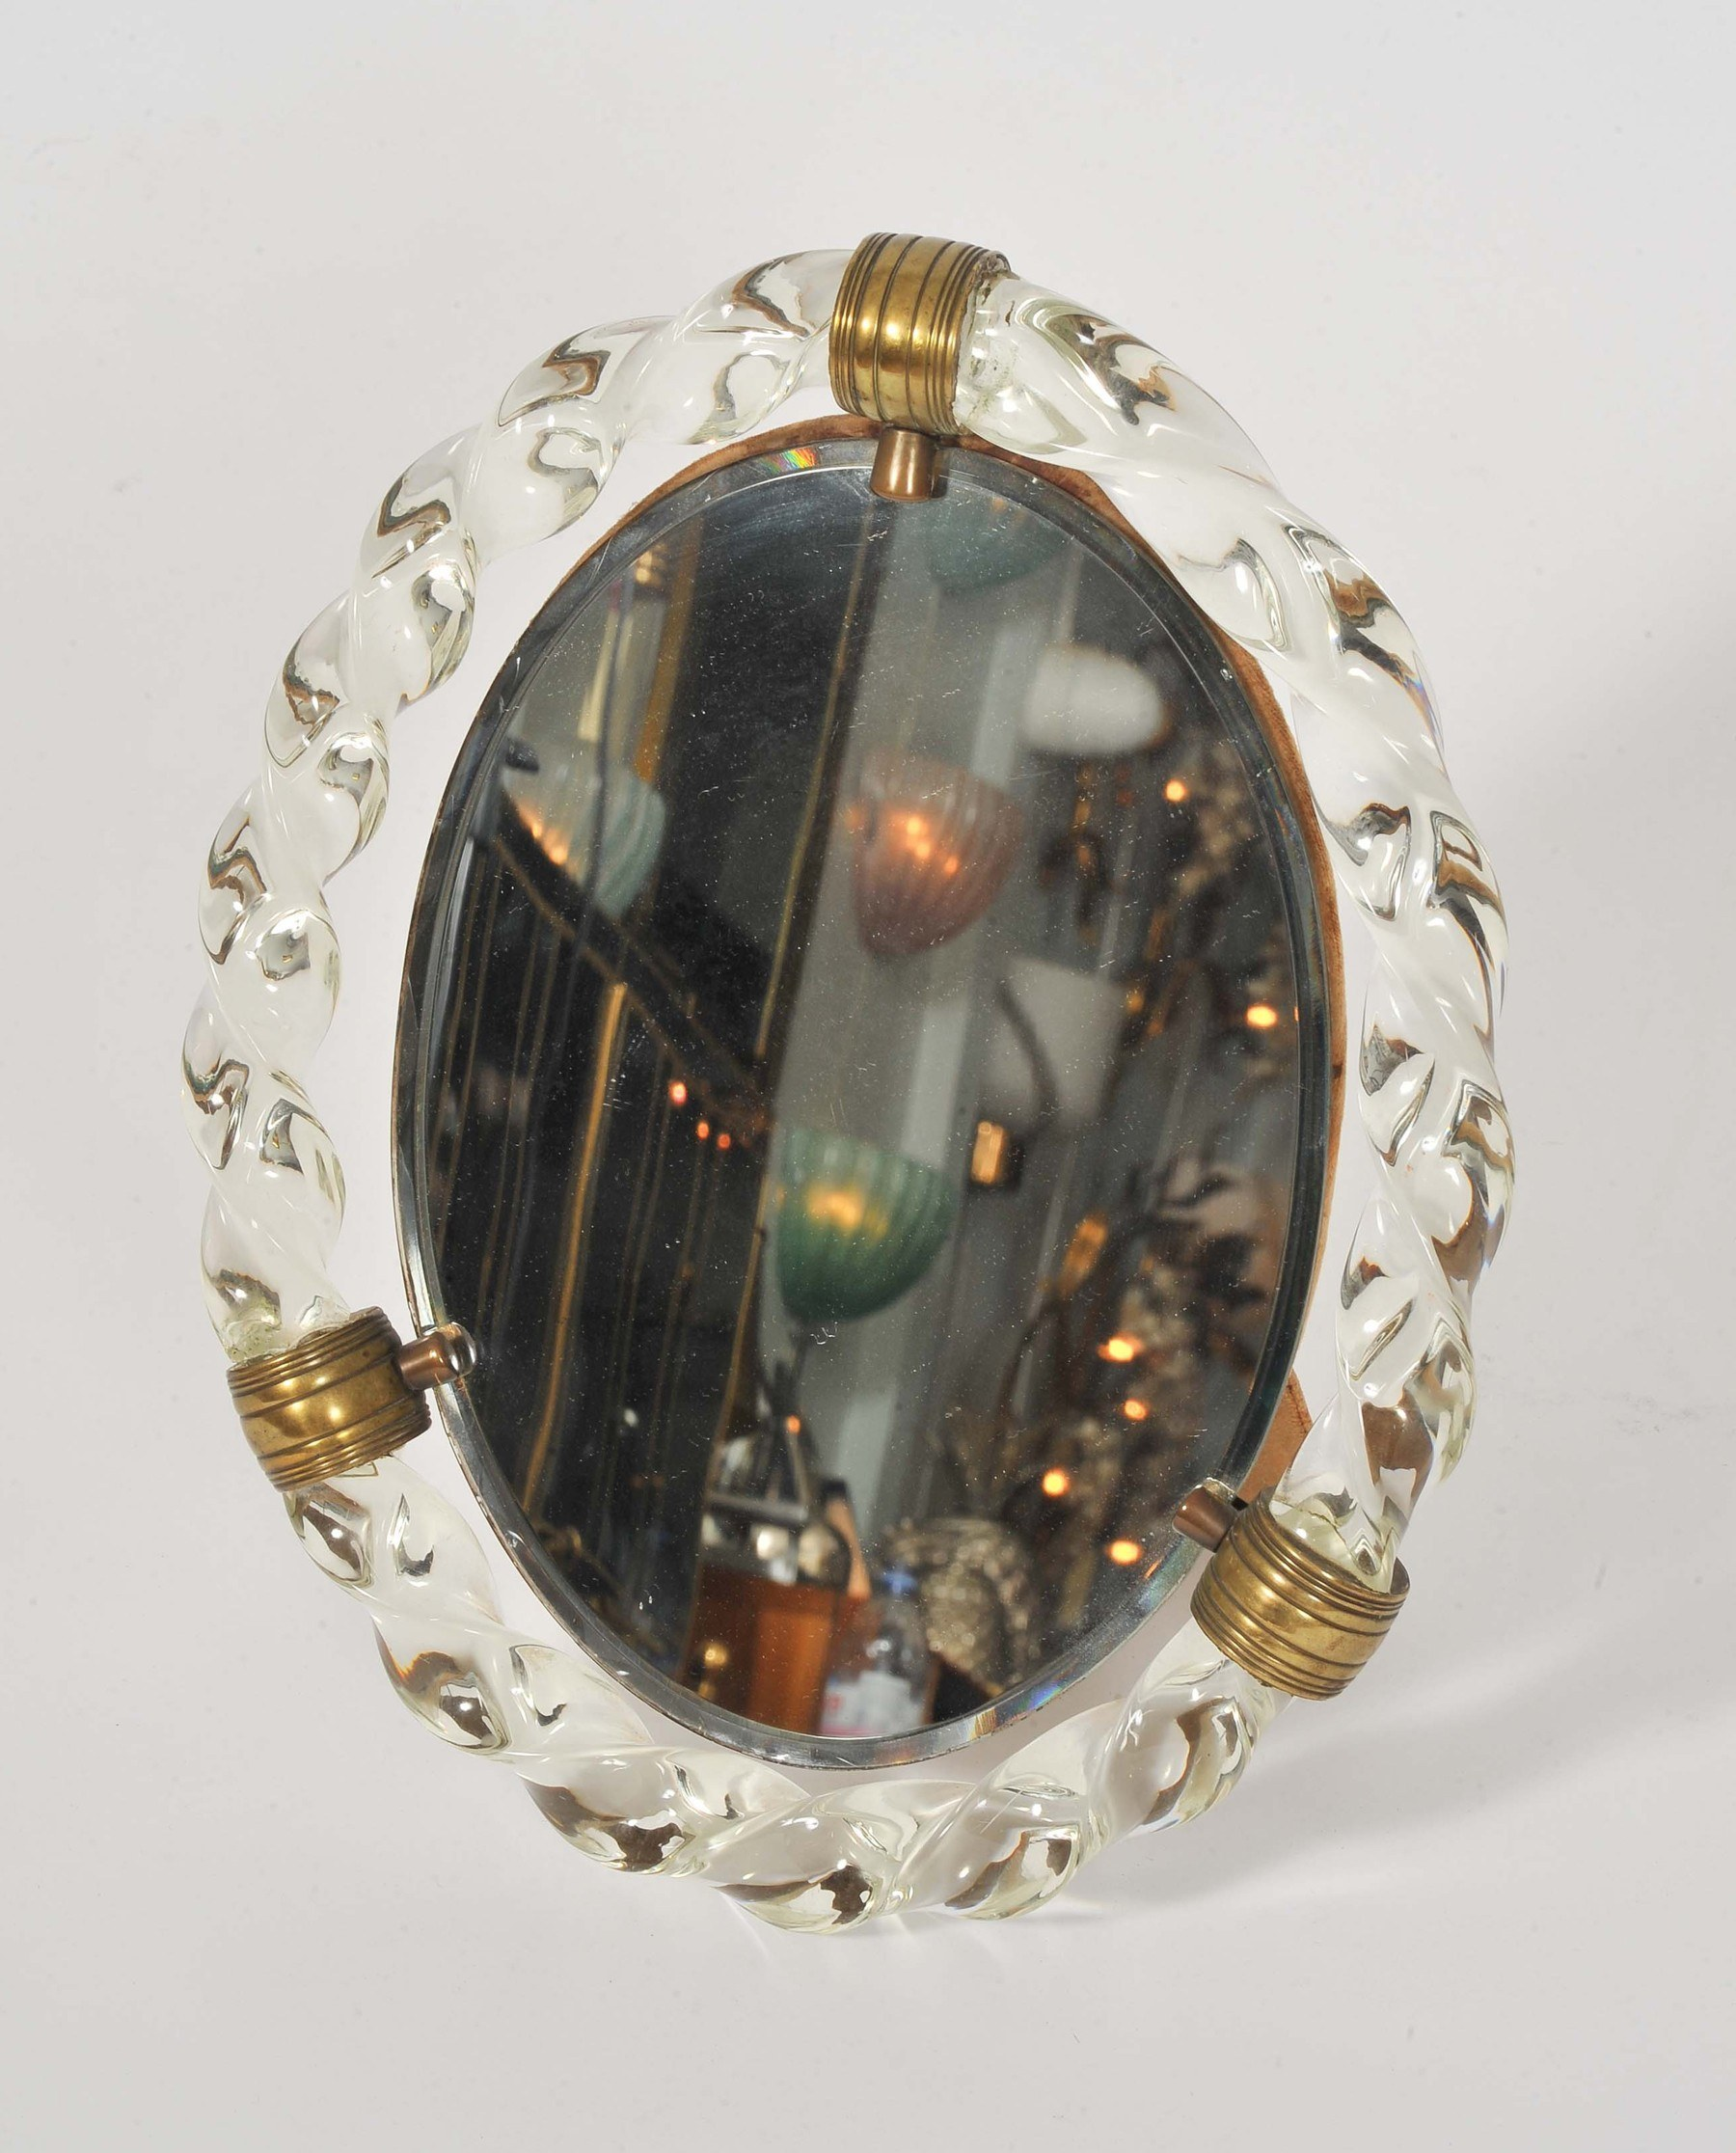 Valerie Wade Mt669 1950S Italian Oval Dressing Table Mirror 02